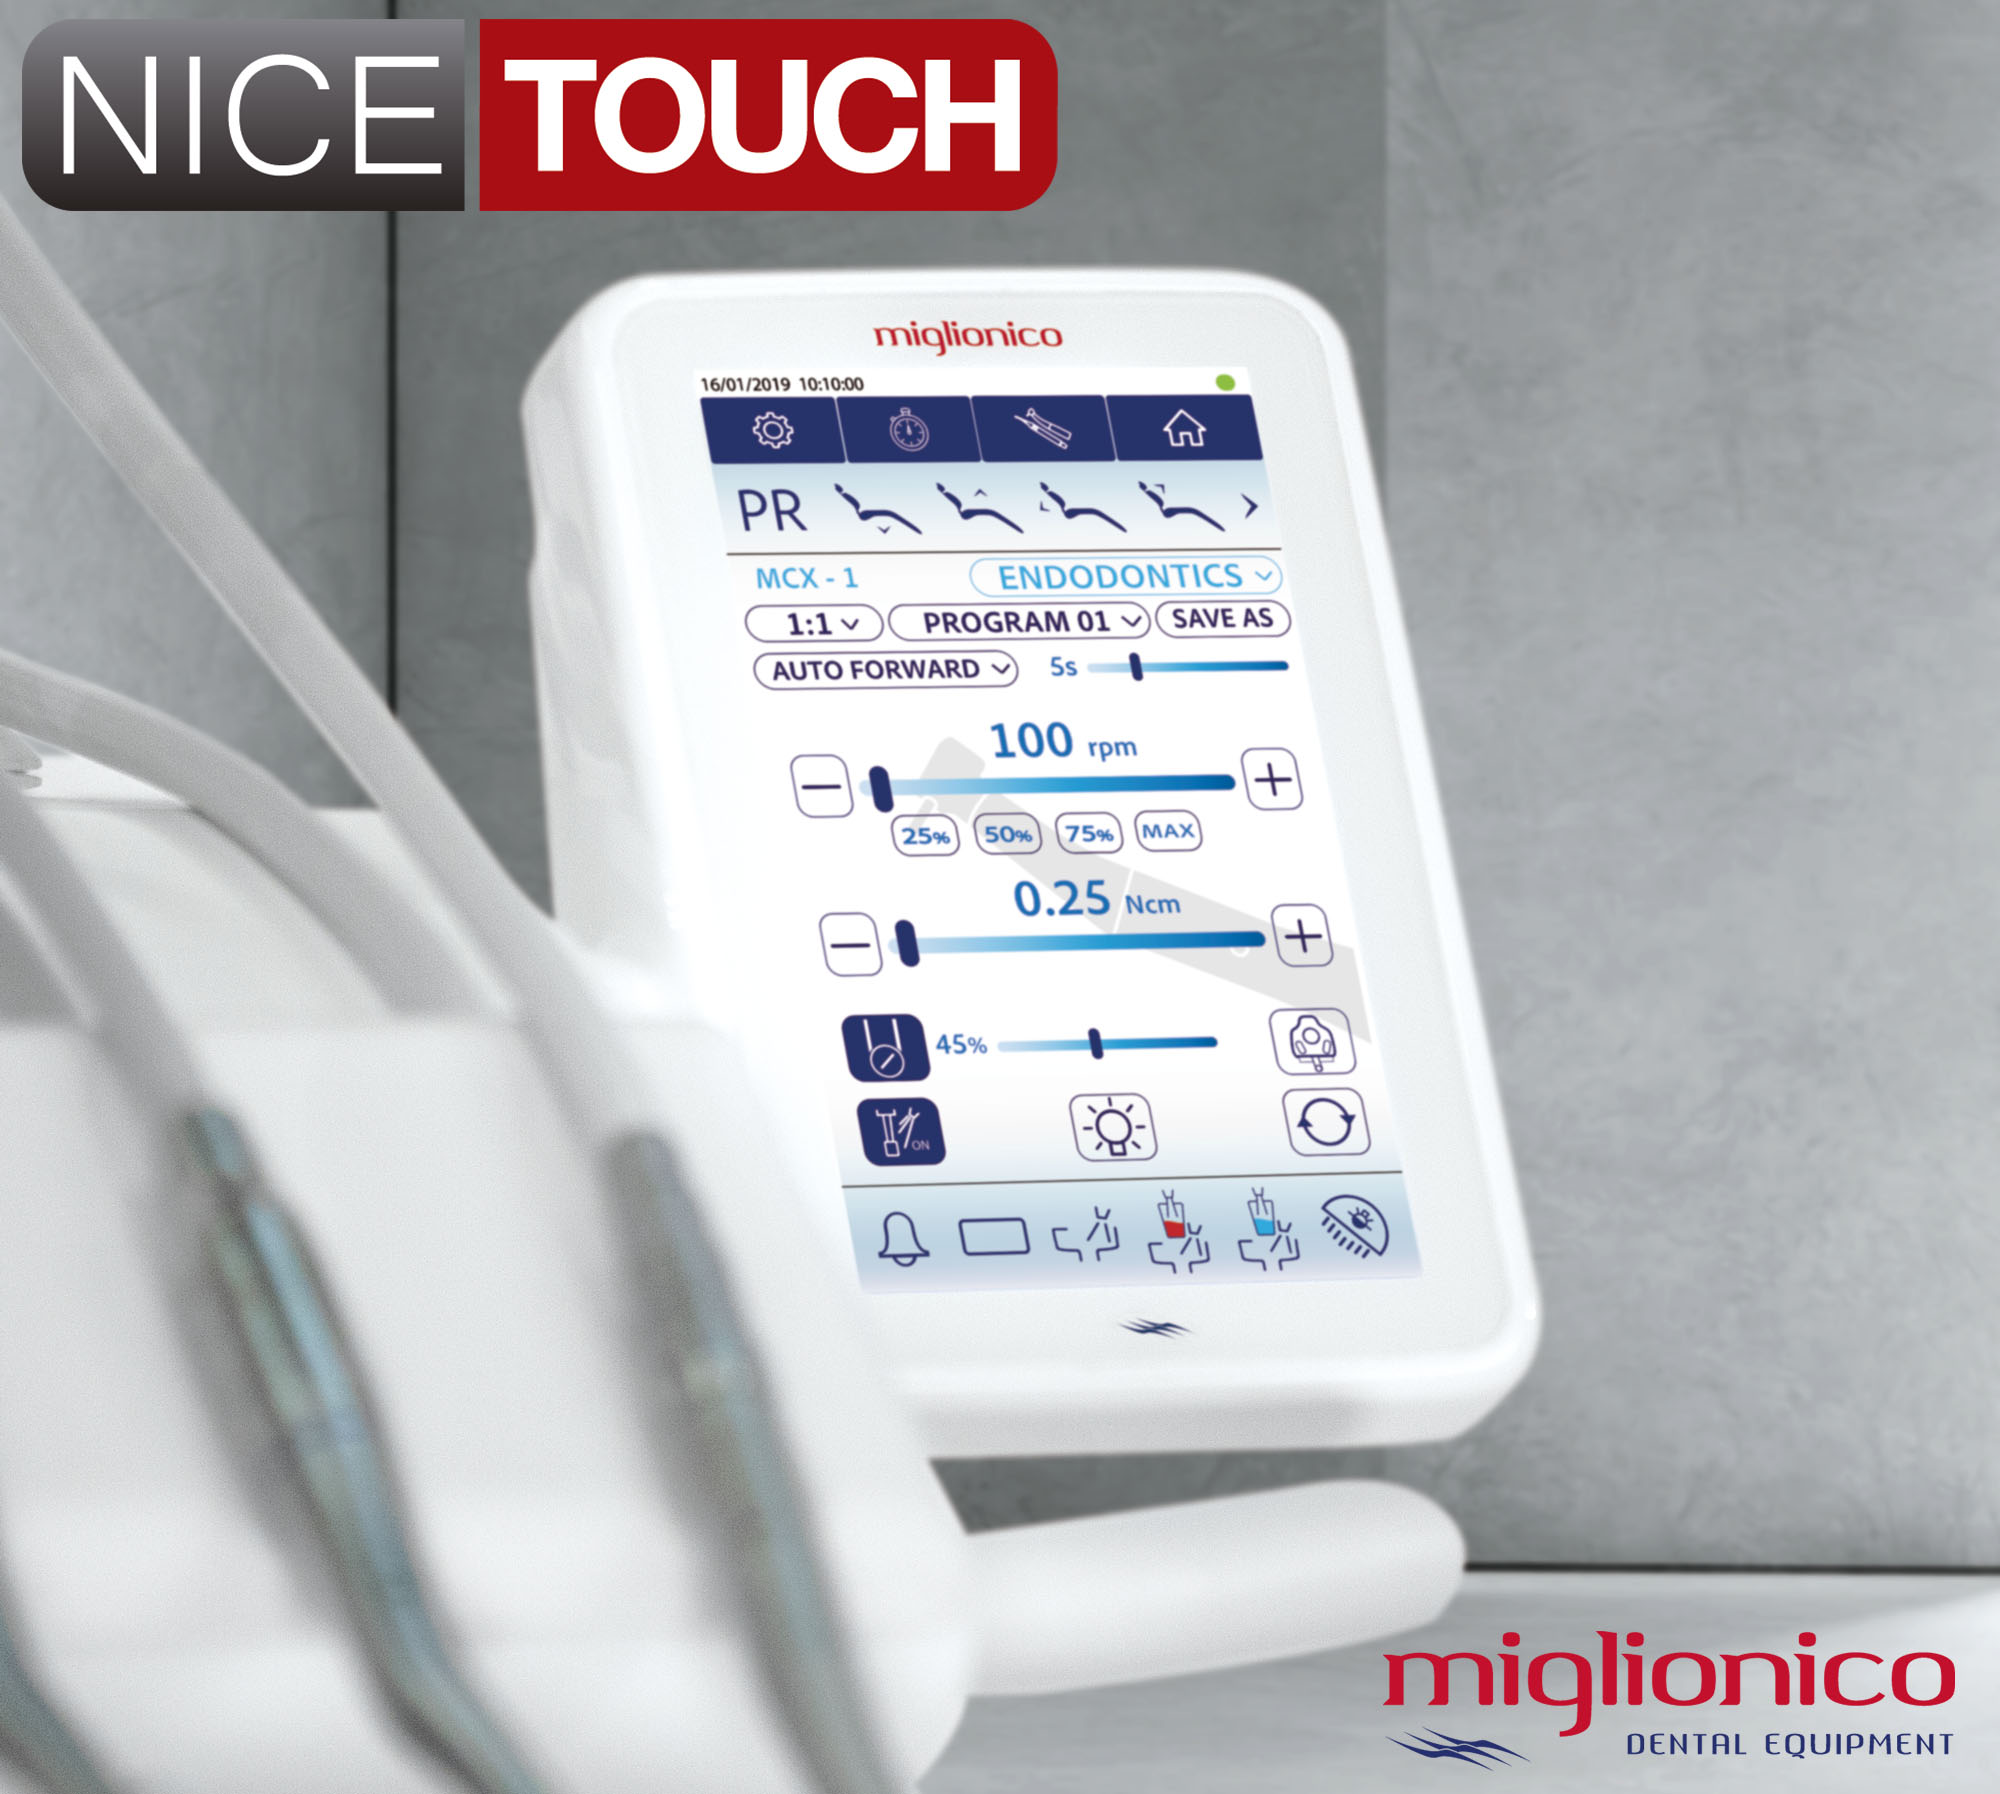 Pantalla Digital 7 pulgadas a todo color Miglionico Nice Touch